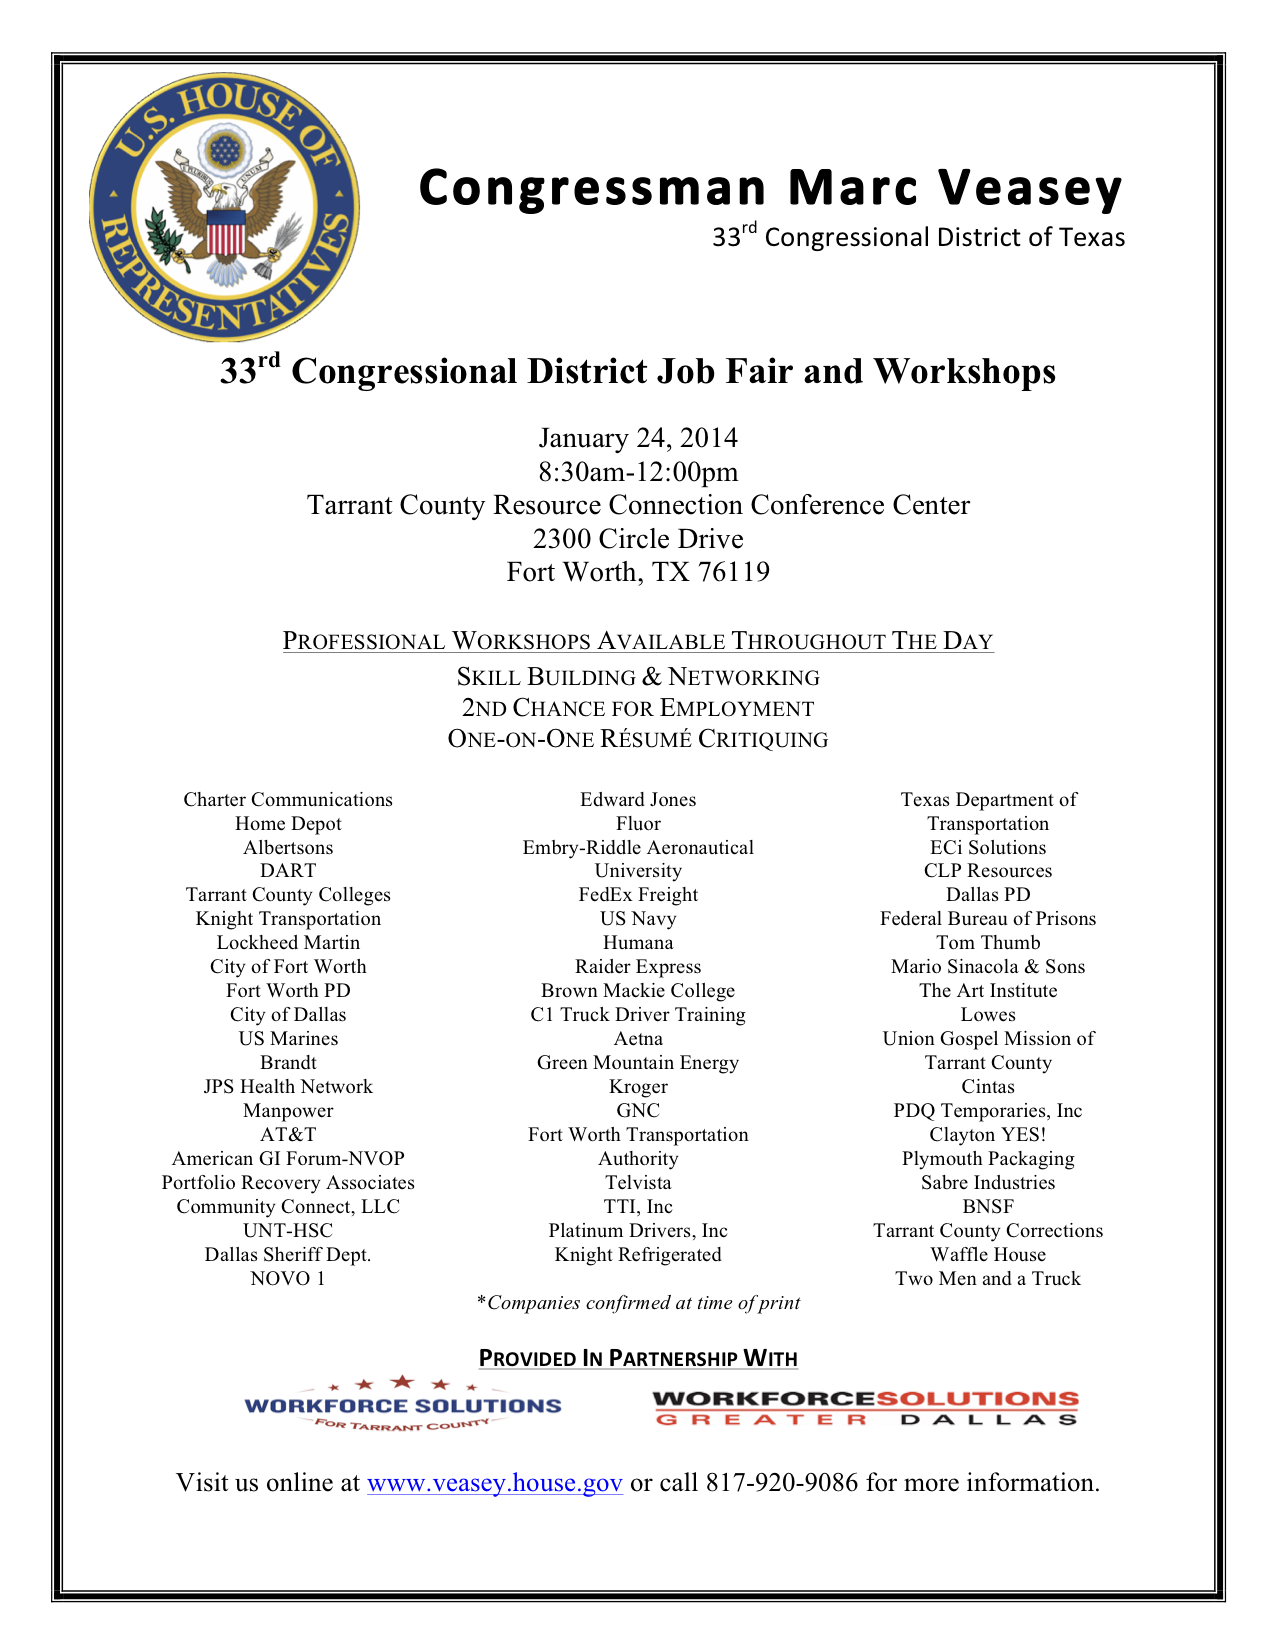 33rd Congressional District Job Fair | Congressman Marc Veasey